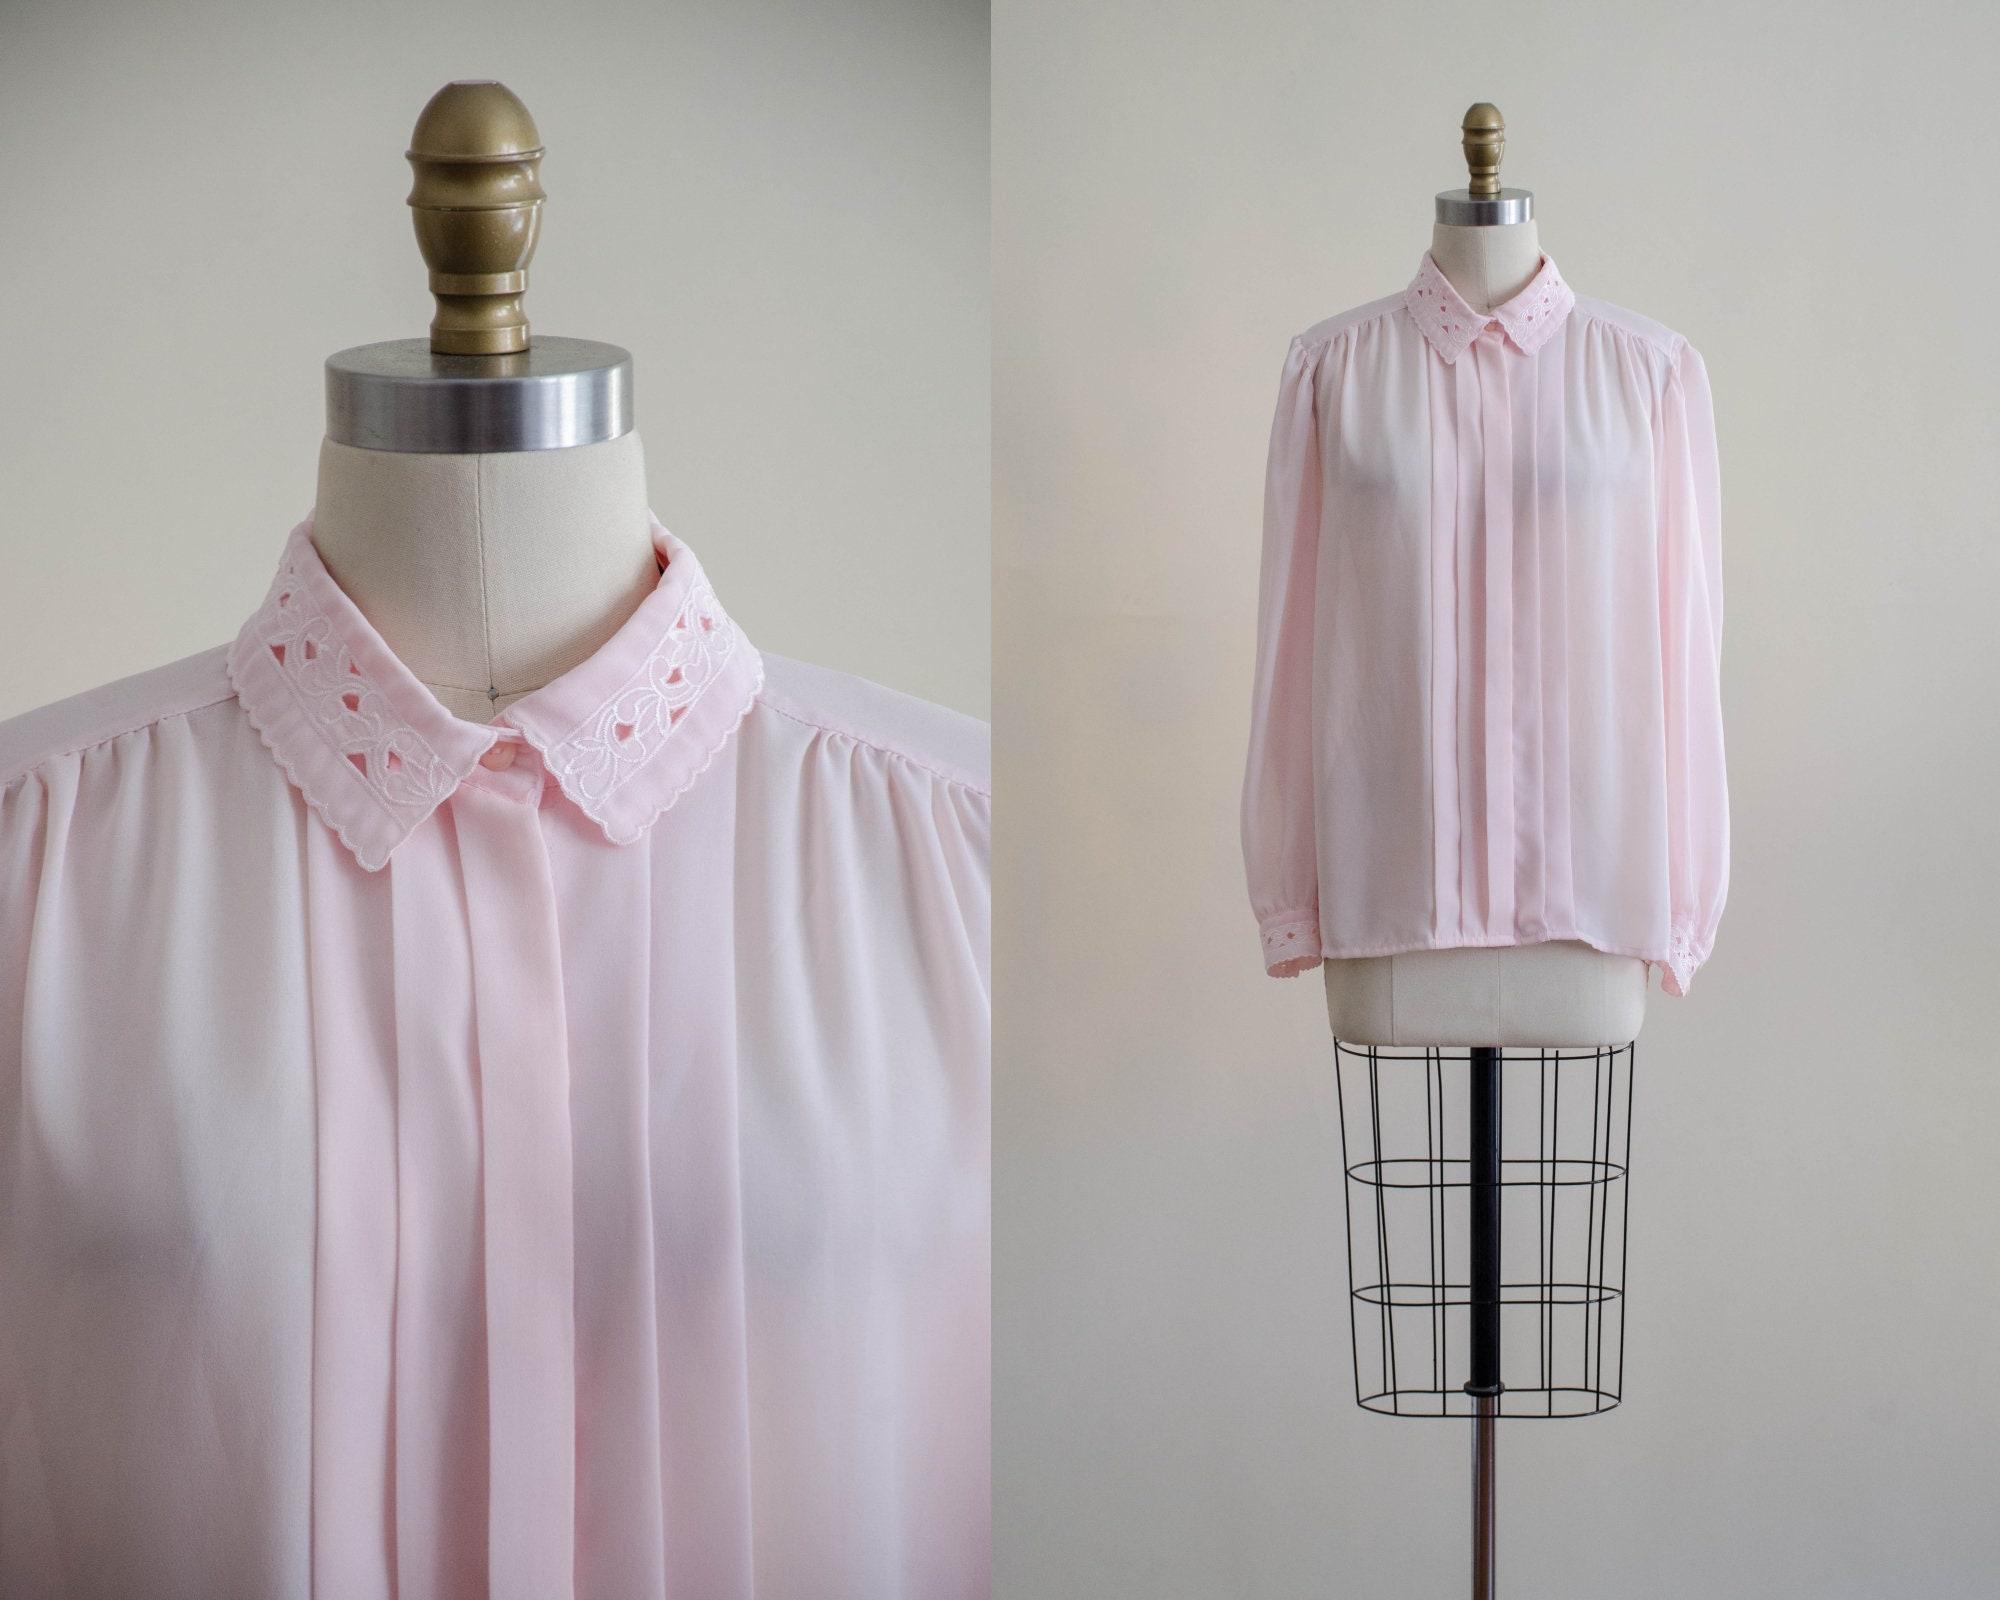 80s Tops, Shirts, T-shirts, Blouse   90s T-shirts 80S Pink Lace Collar Blouse  Blush Embroidered Romantic Cottagecore Vintage Shirt $40.00 AT vintagedancer.com